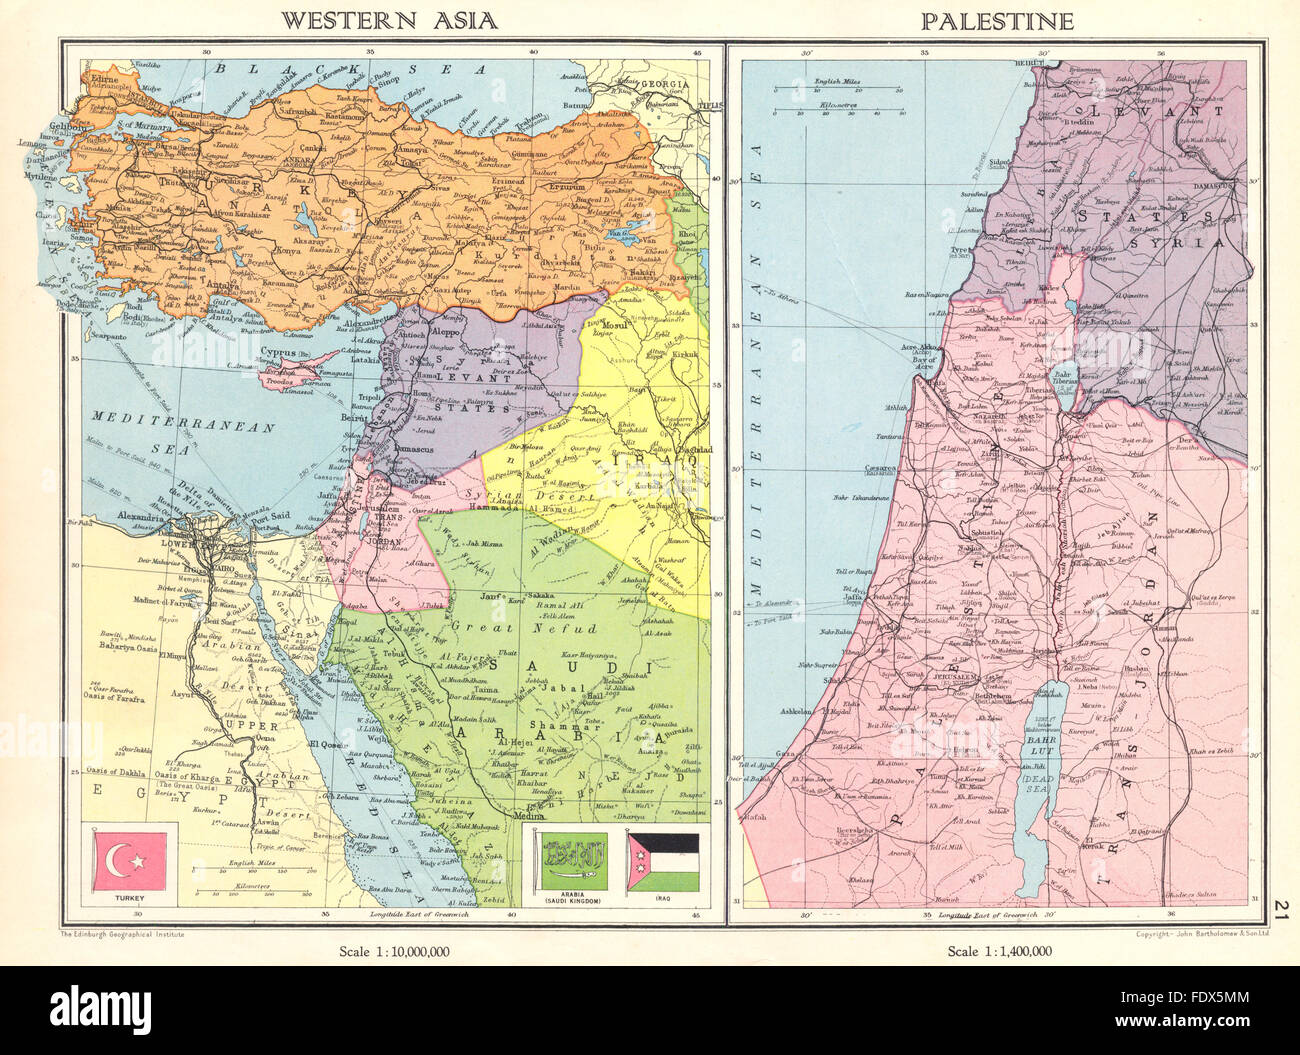 Karte Naher Osten Israel.Naher Osten Turkei Transjordanien Palastina Israel Syrien